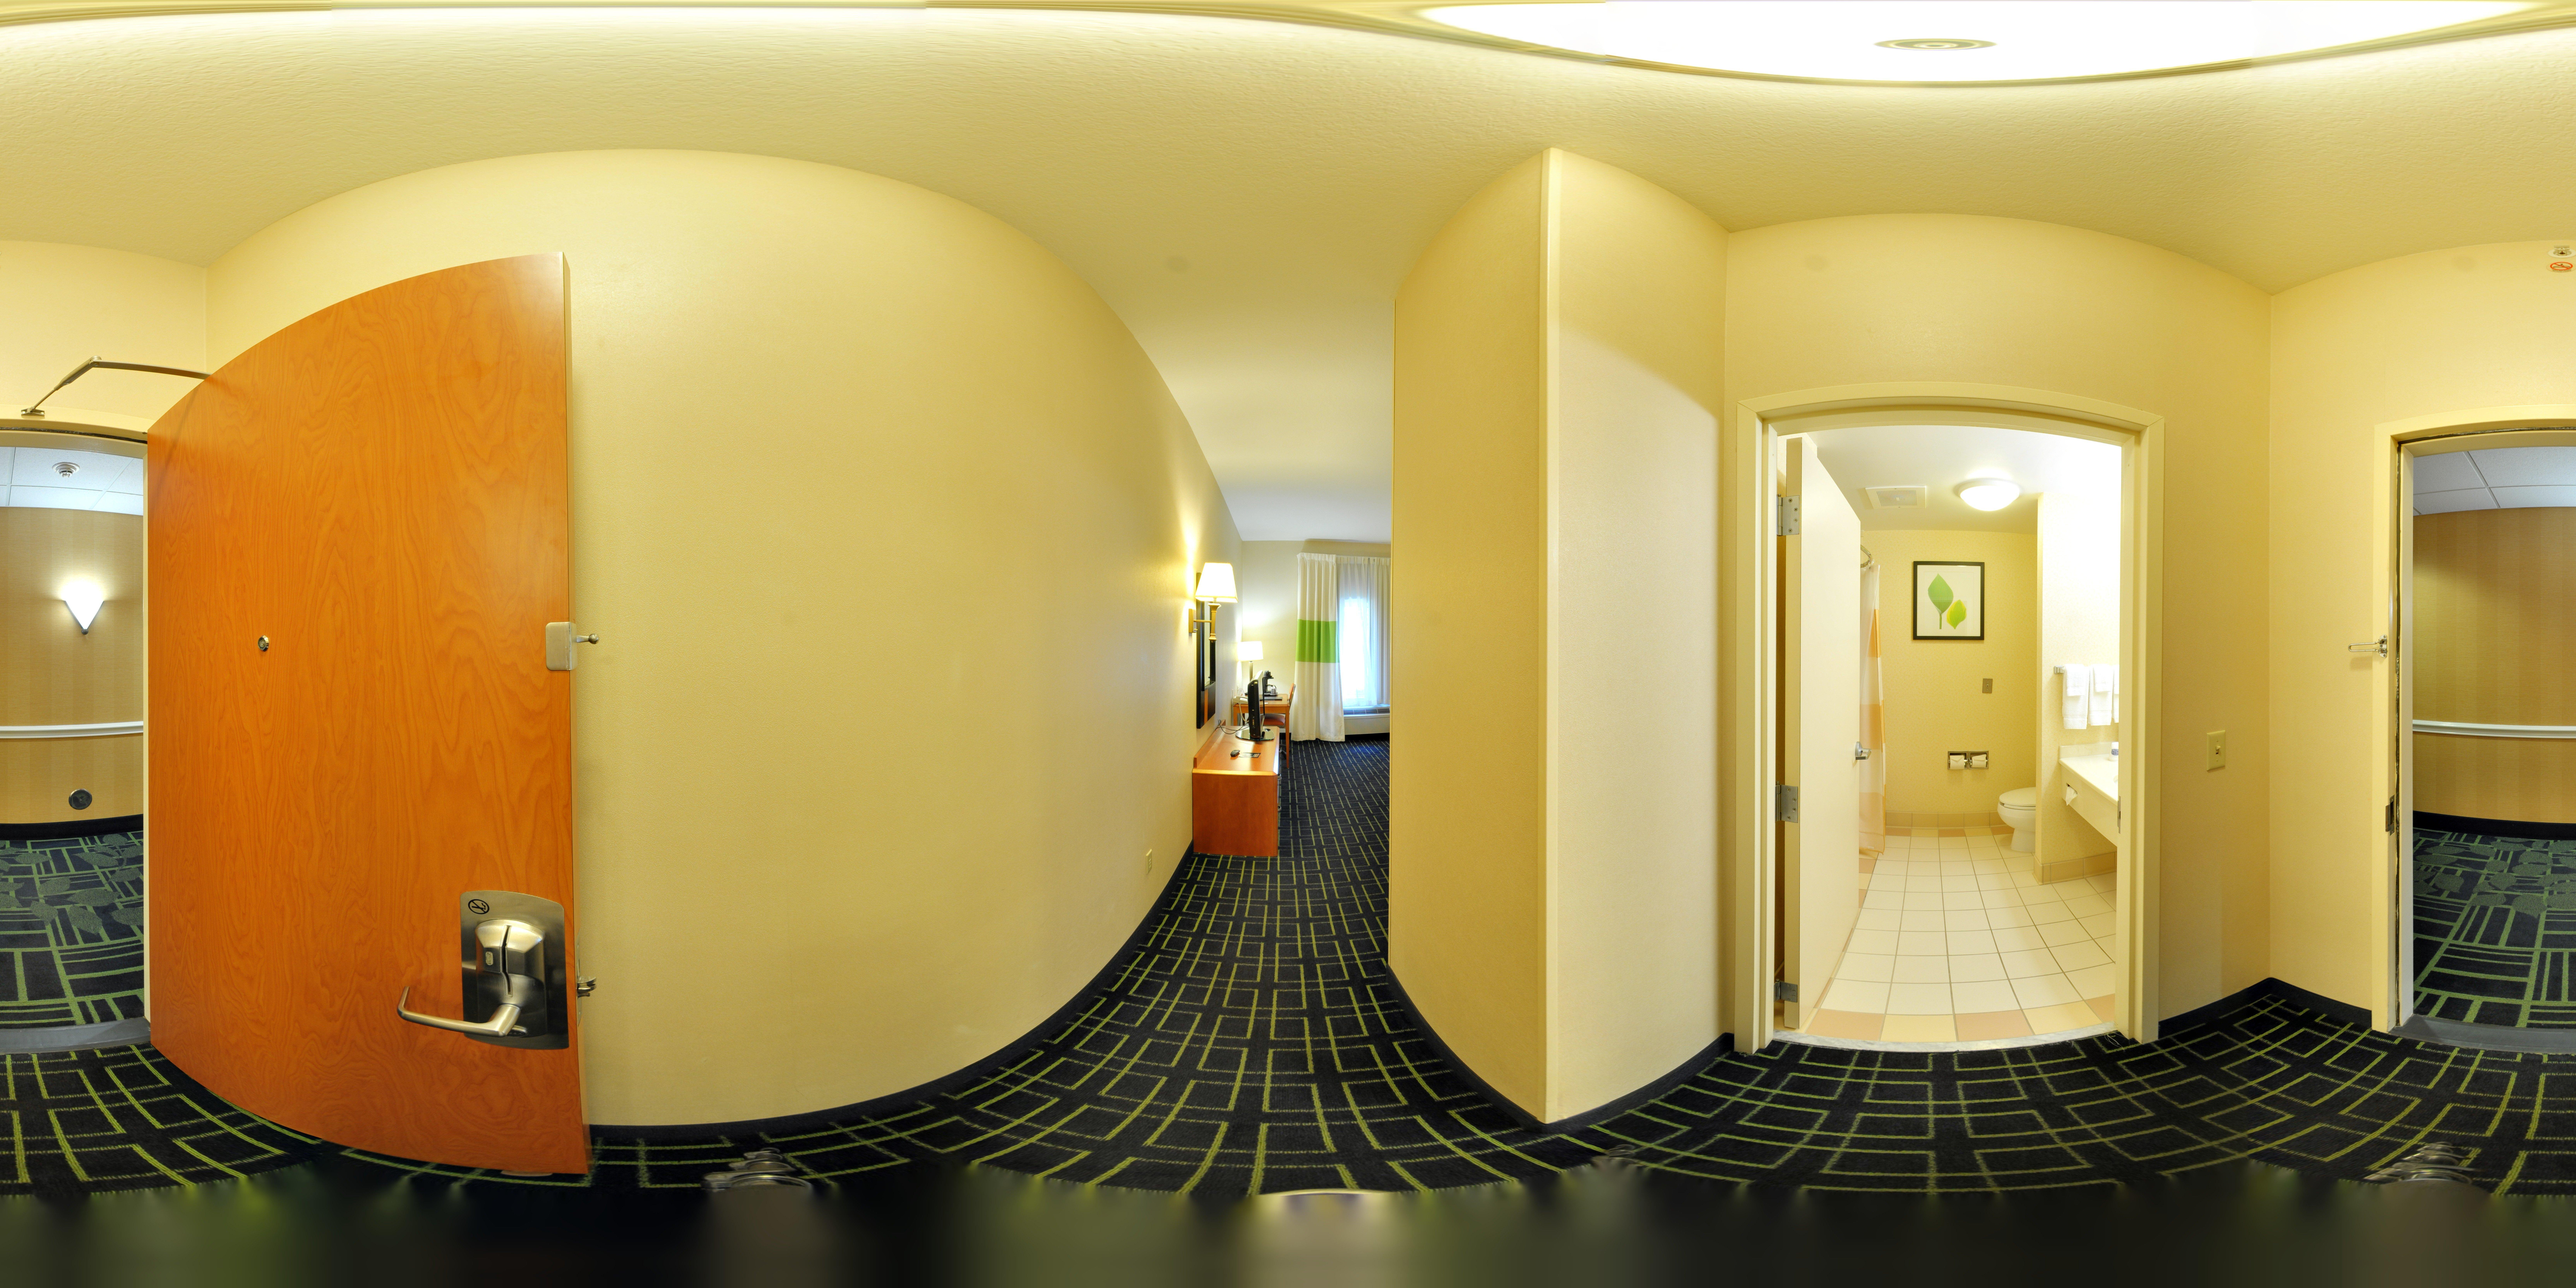 Fairfield Inn & Suites by Marriott Akron South image 43